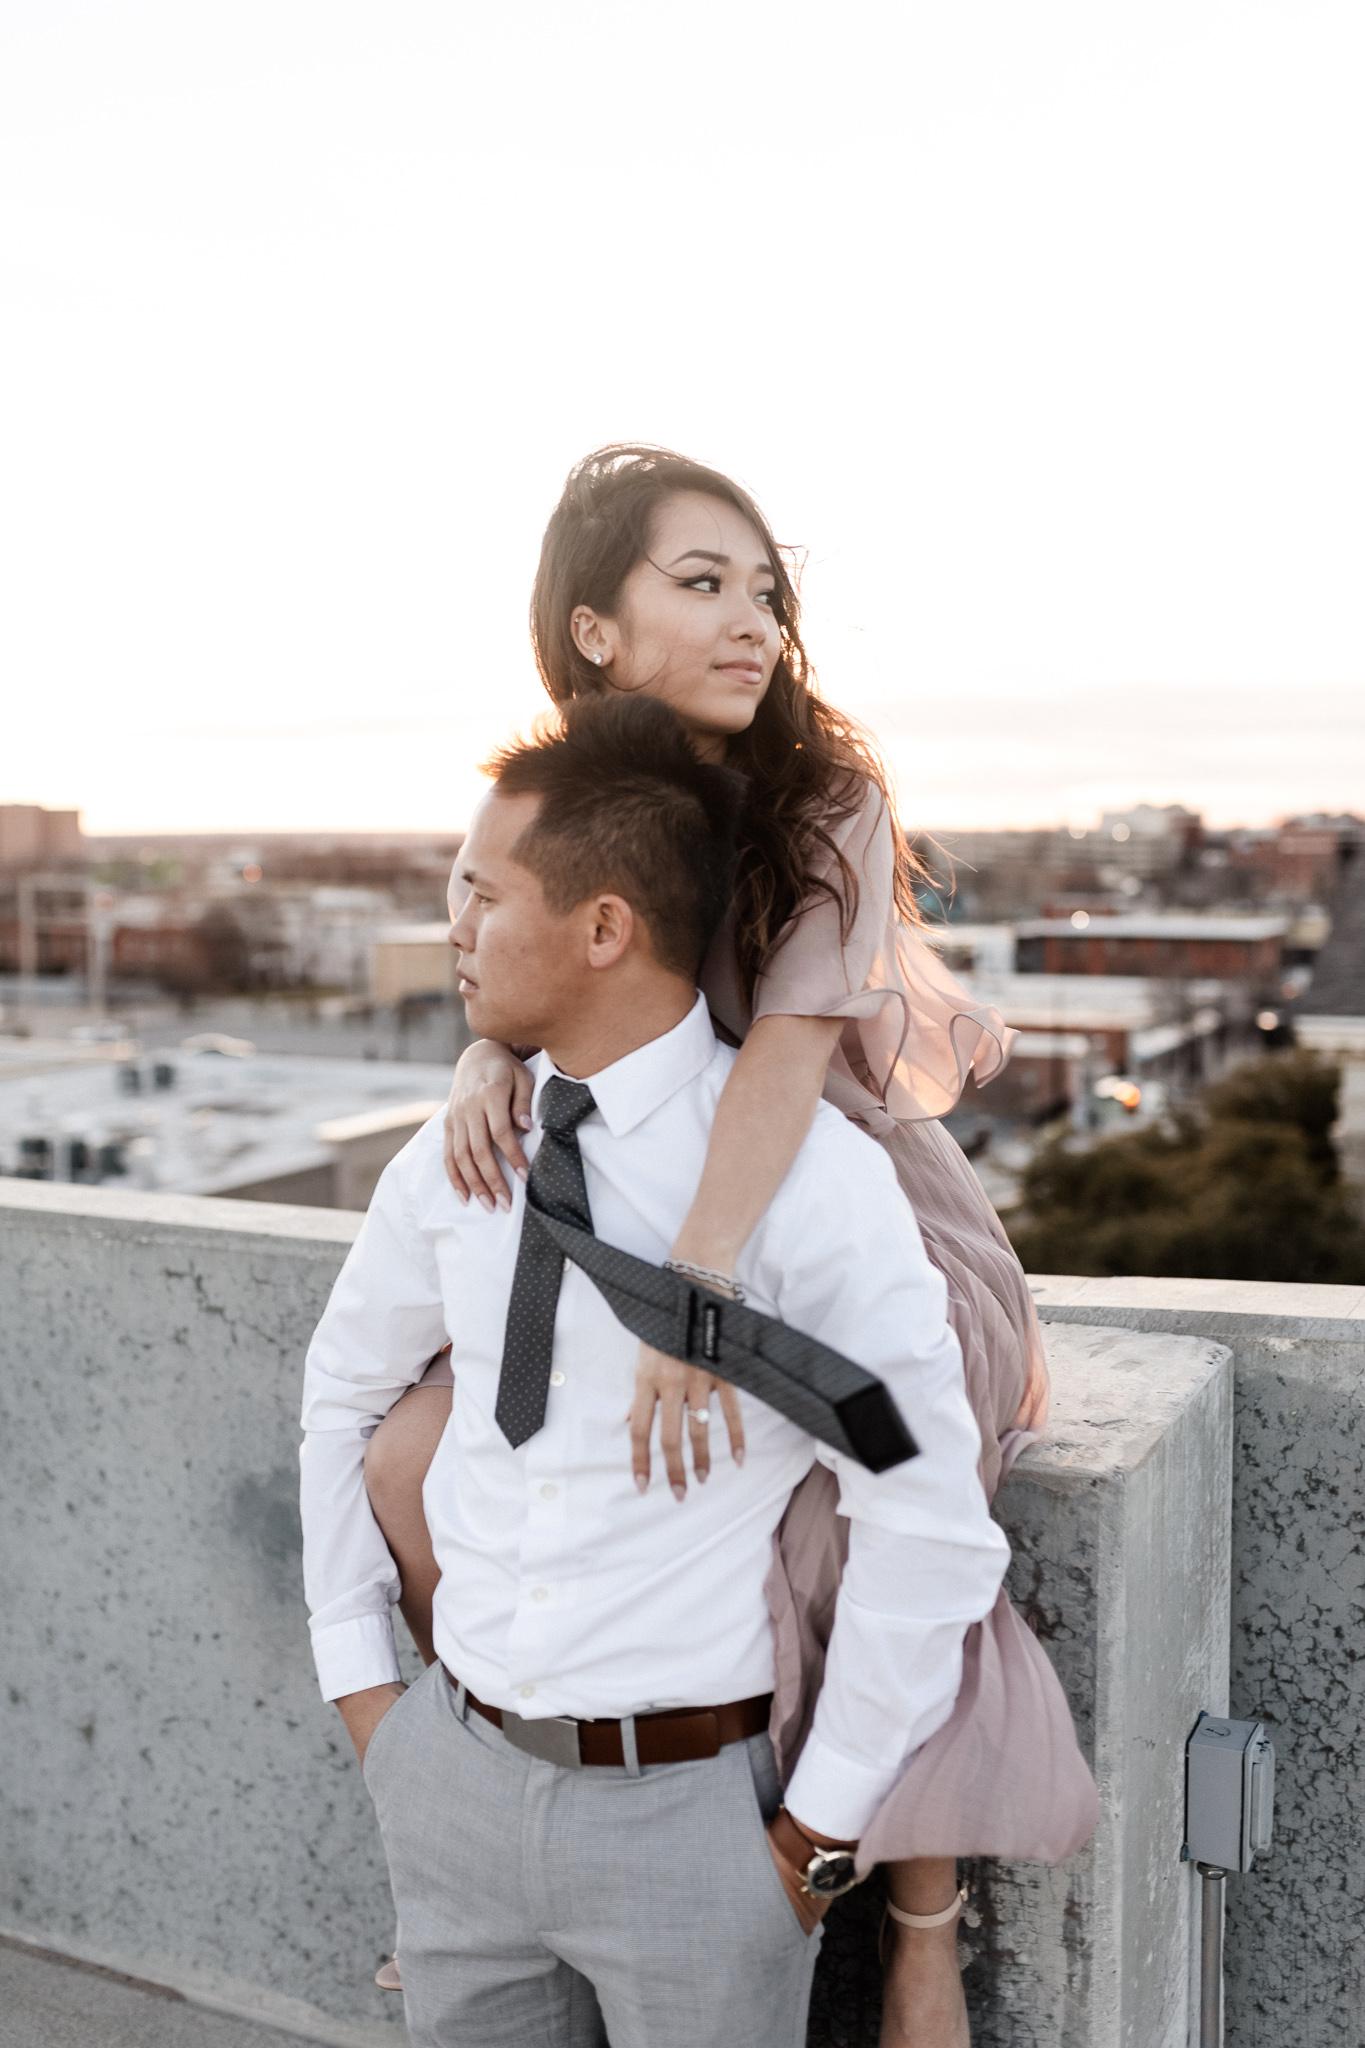 Hieu + Teresa | Colorful Romantic Downtown Engagements | Oklahoma Wedding Photographer-65.jpg